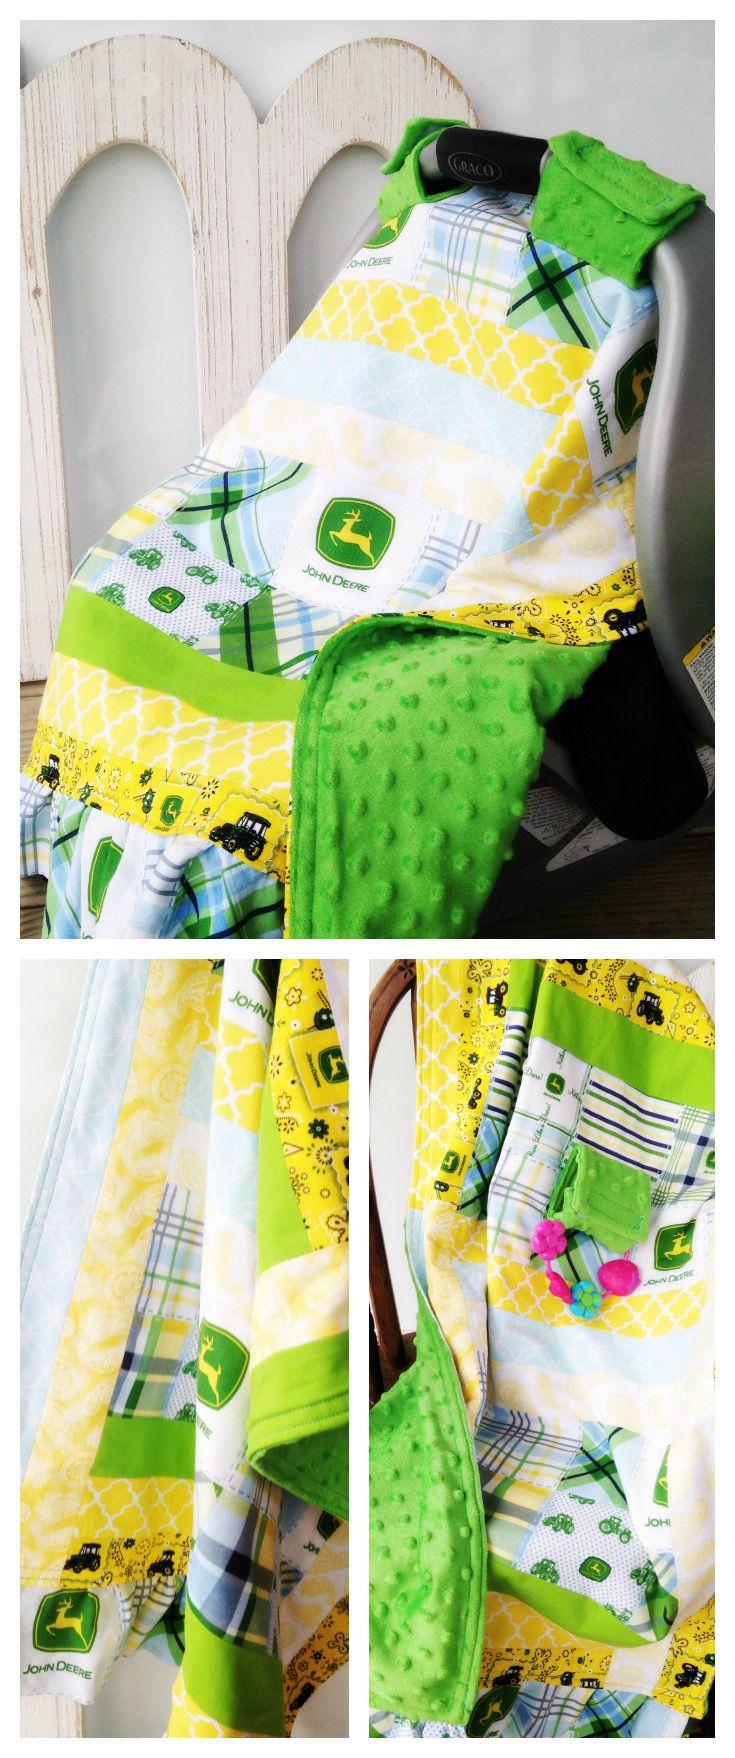 Toddler Teething Quilt & Car Seat Cover, John Deere Nursery, Baby Boy, Blue Green Aqua Yellow Teal Minky, Crib Bedding Blanket, Deer, Farmer, Farm, Toddler Bedroom Room Theme, Canopy, Shower Gift | by Missy Prissy Shop, $45.50